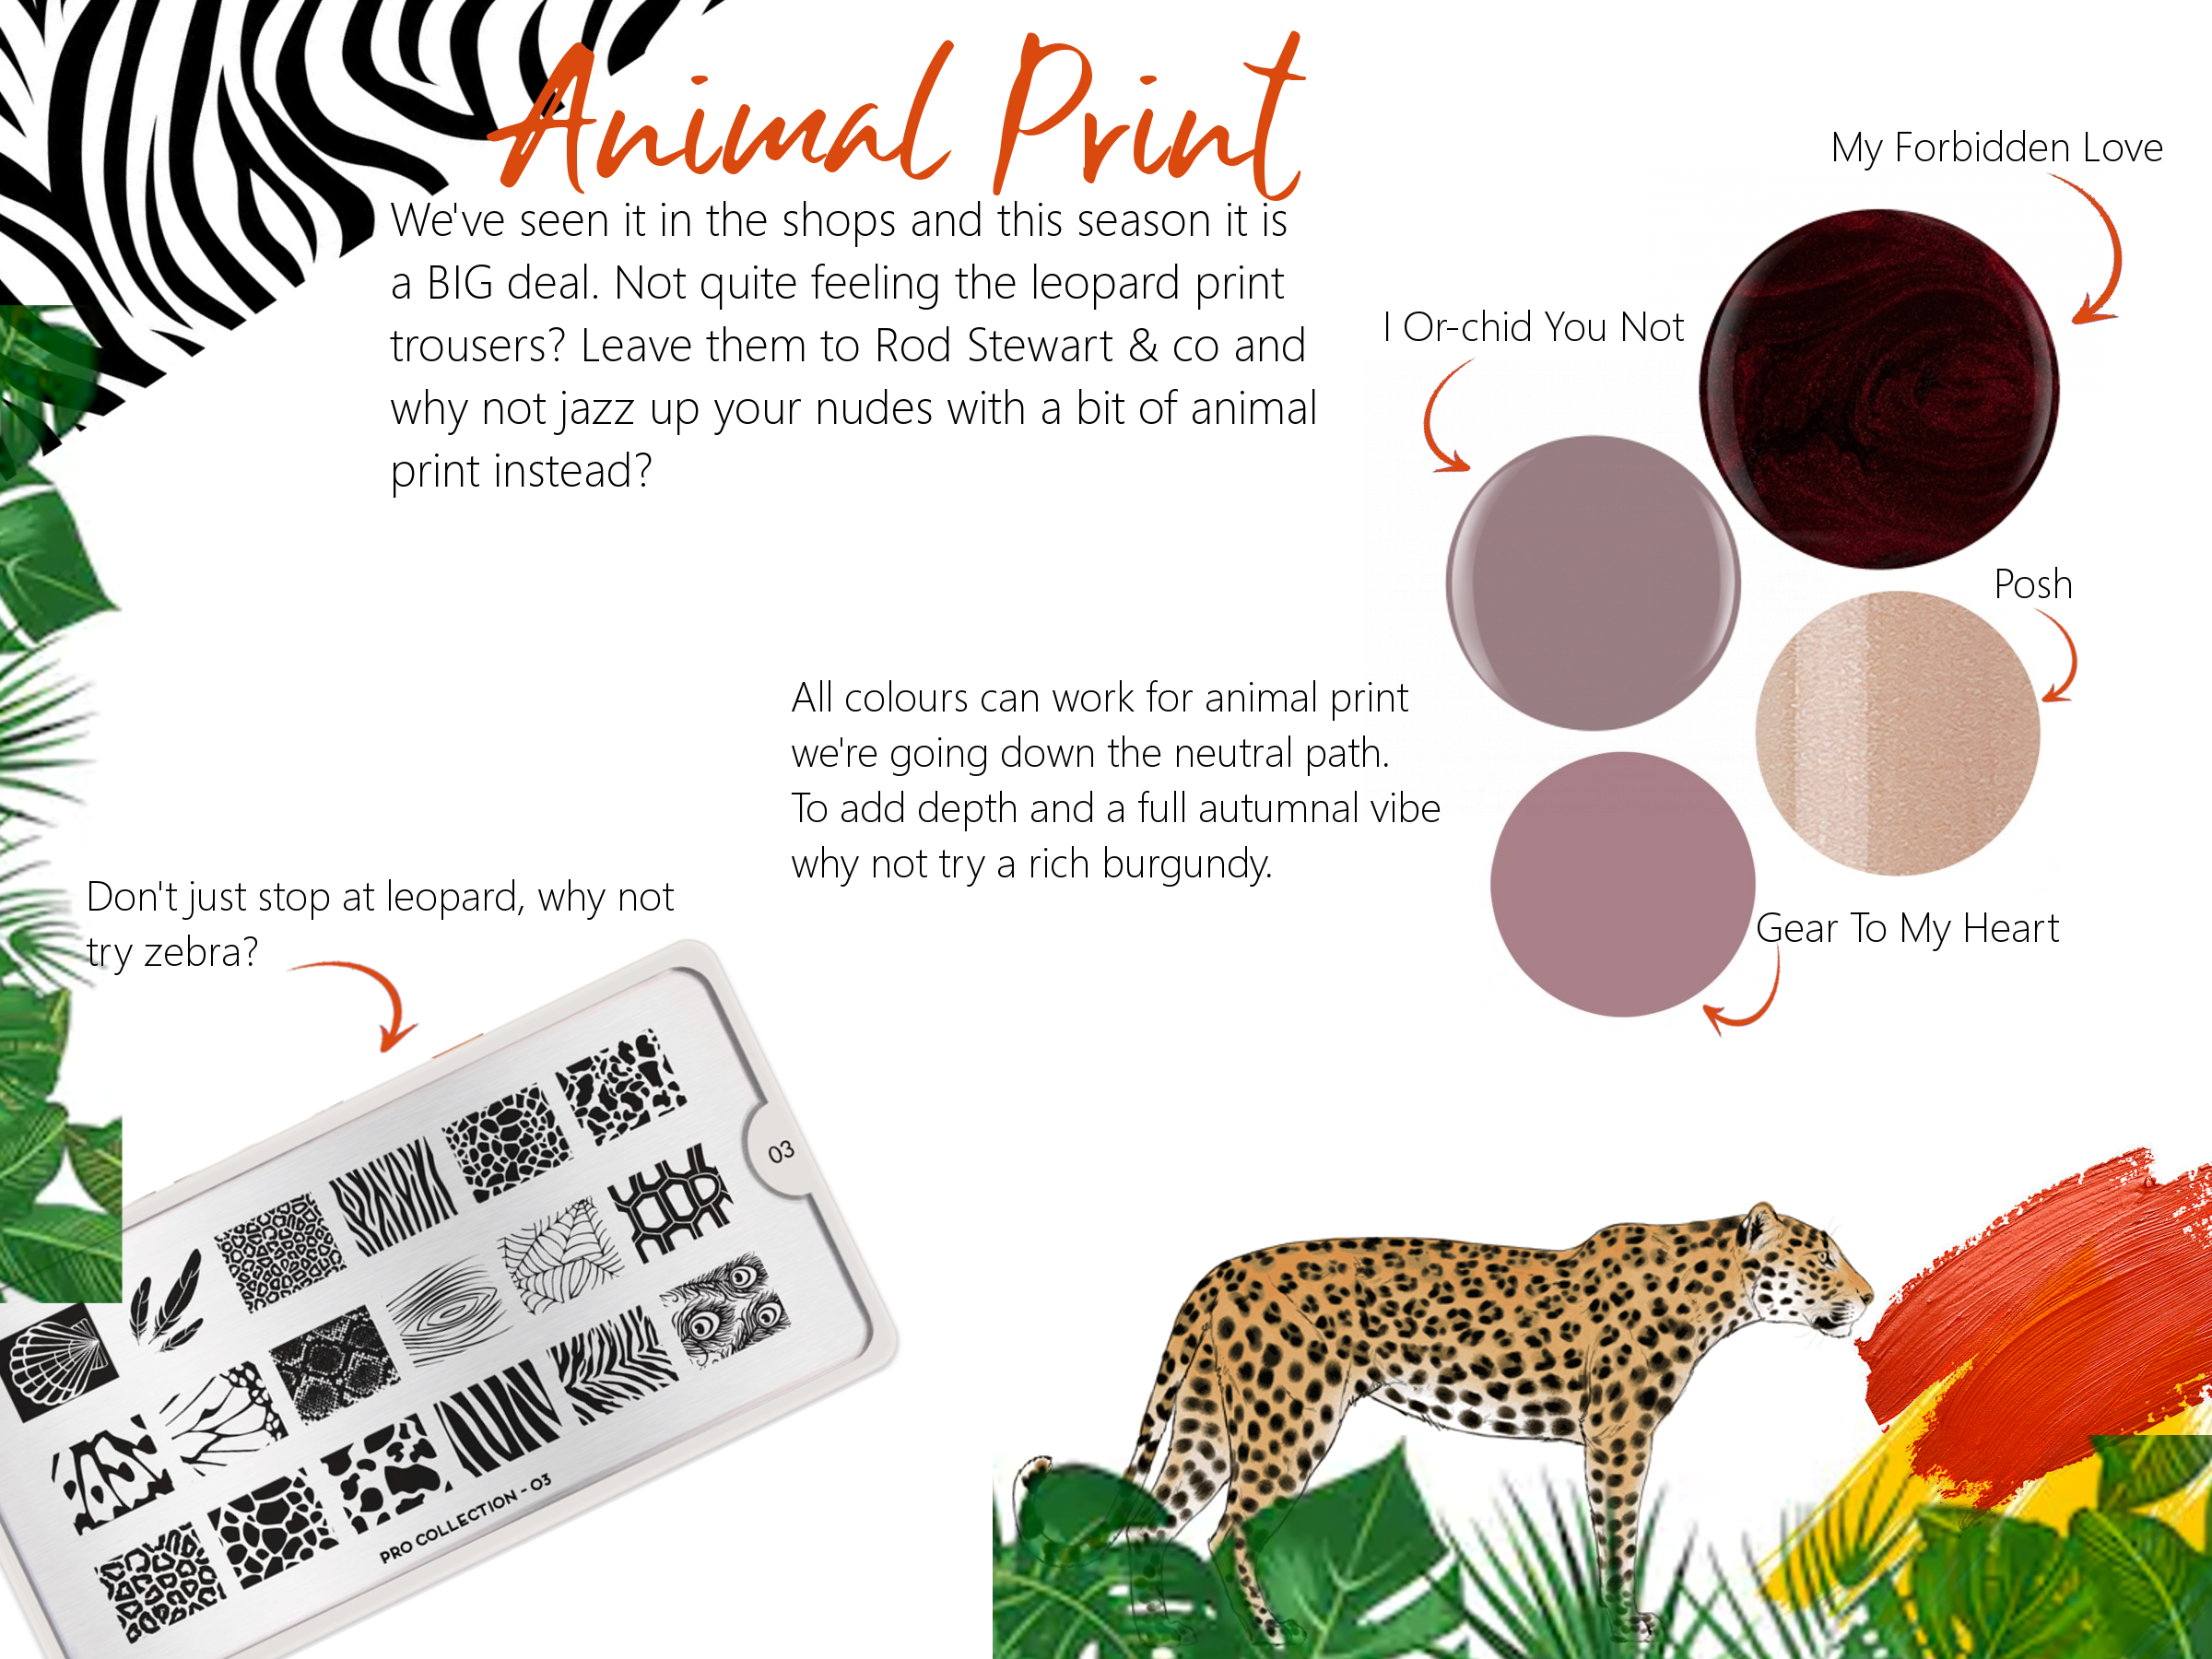 Venus-Beauty-Hair-Salon-Tavistock-Devon-Winter-Trends-Nails-Gelish-Manicure-Animal-Print-Leopard.png